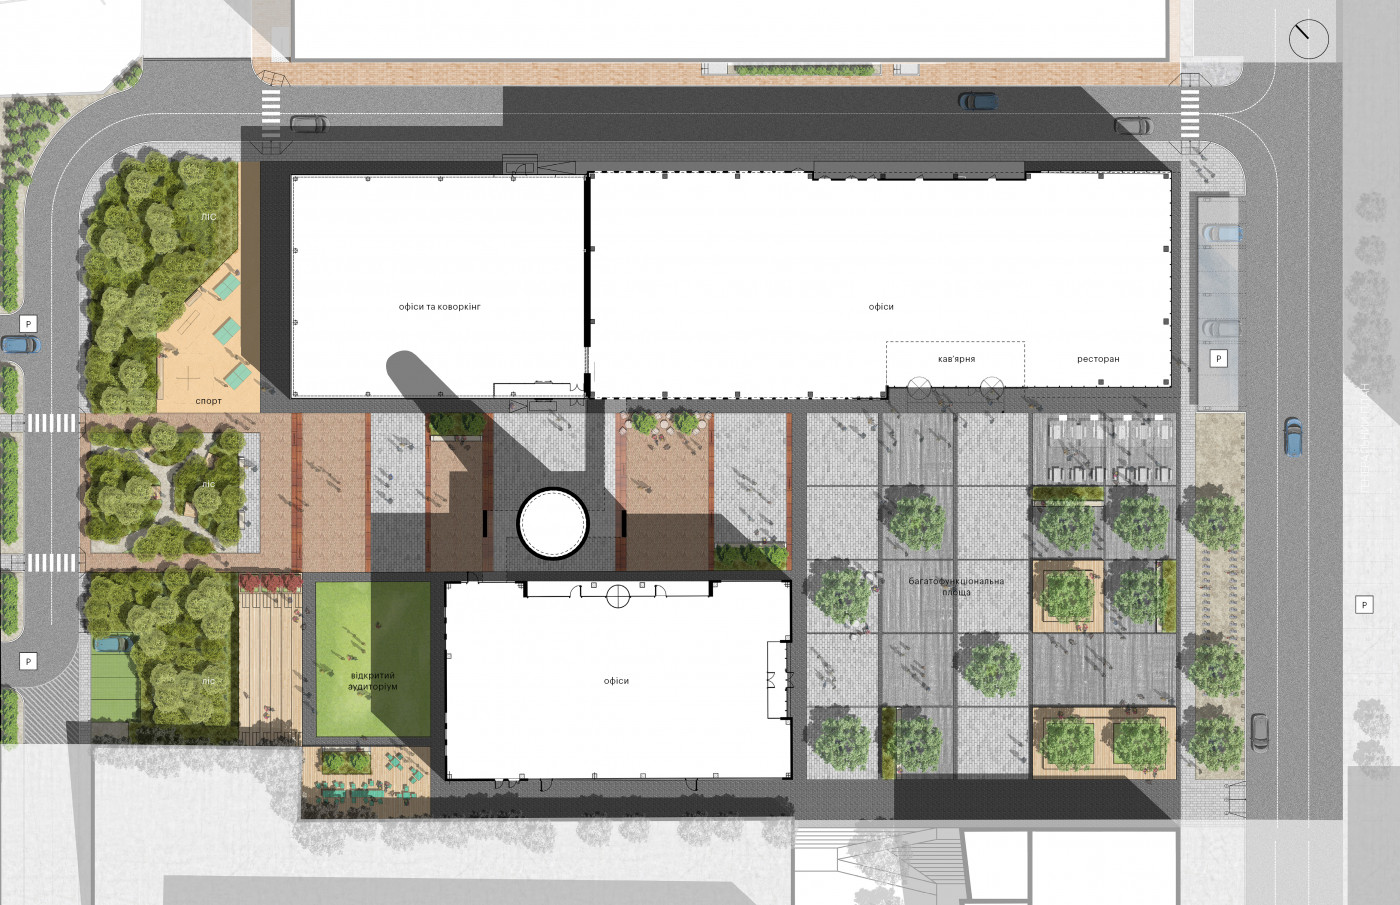 / Event plaza 'UNIT.City'